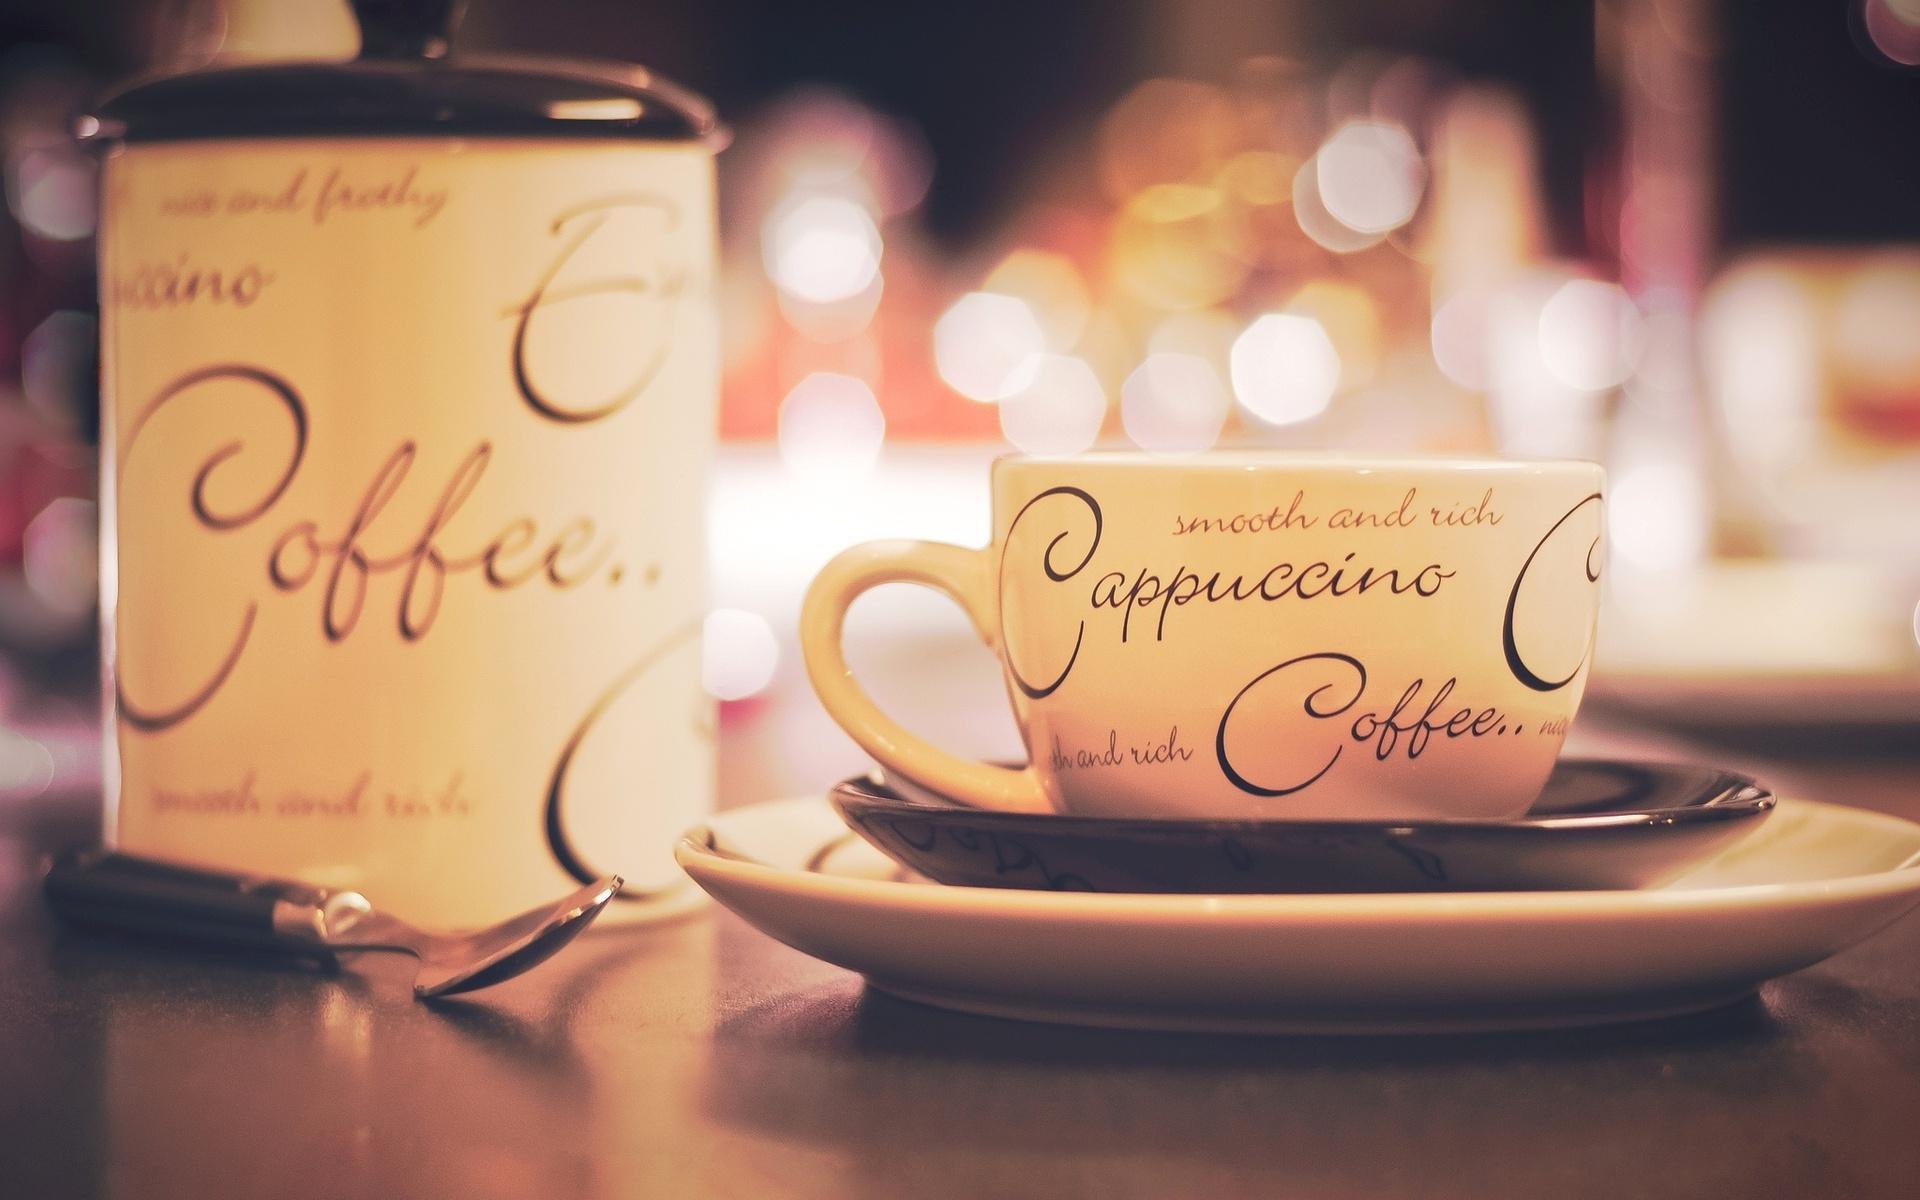 Кофе вокруг чашки бесплатно